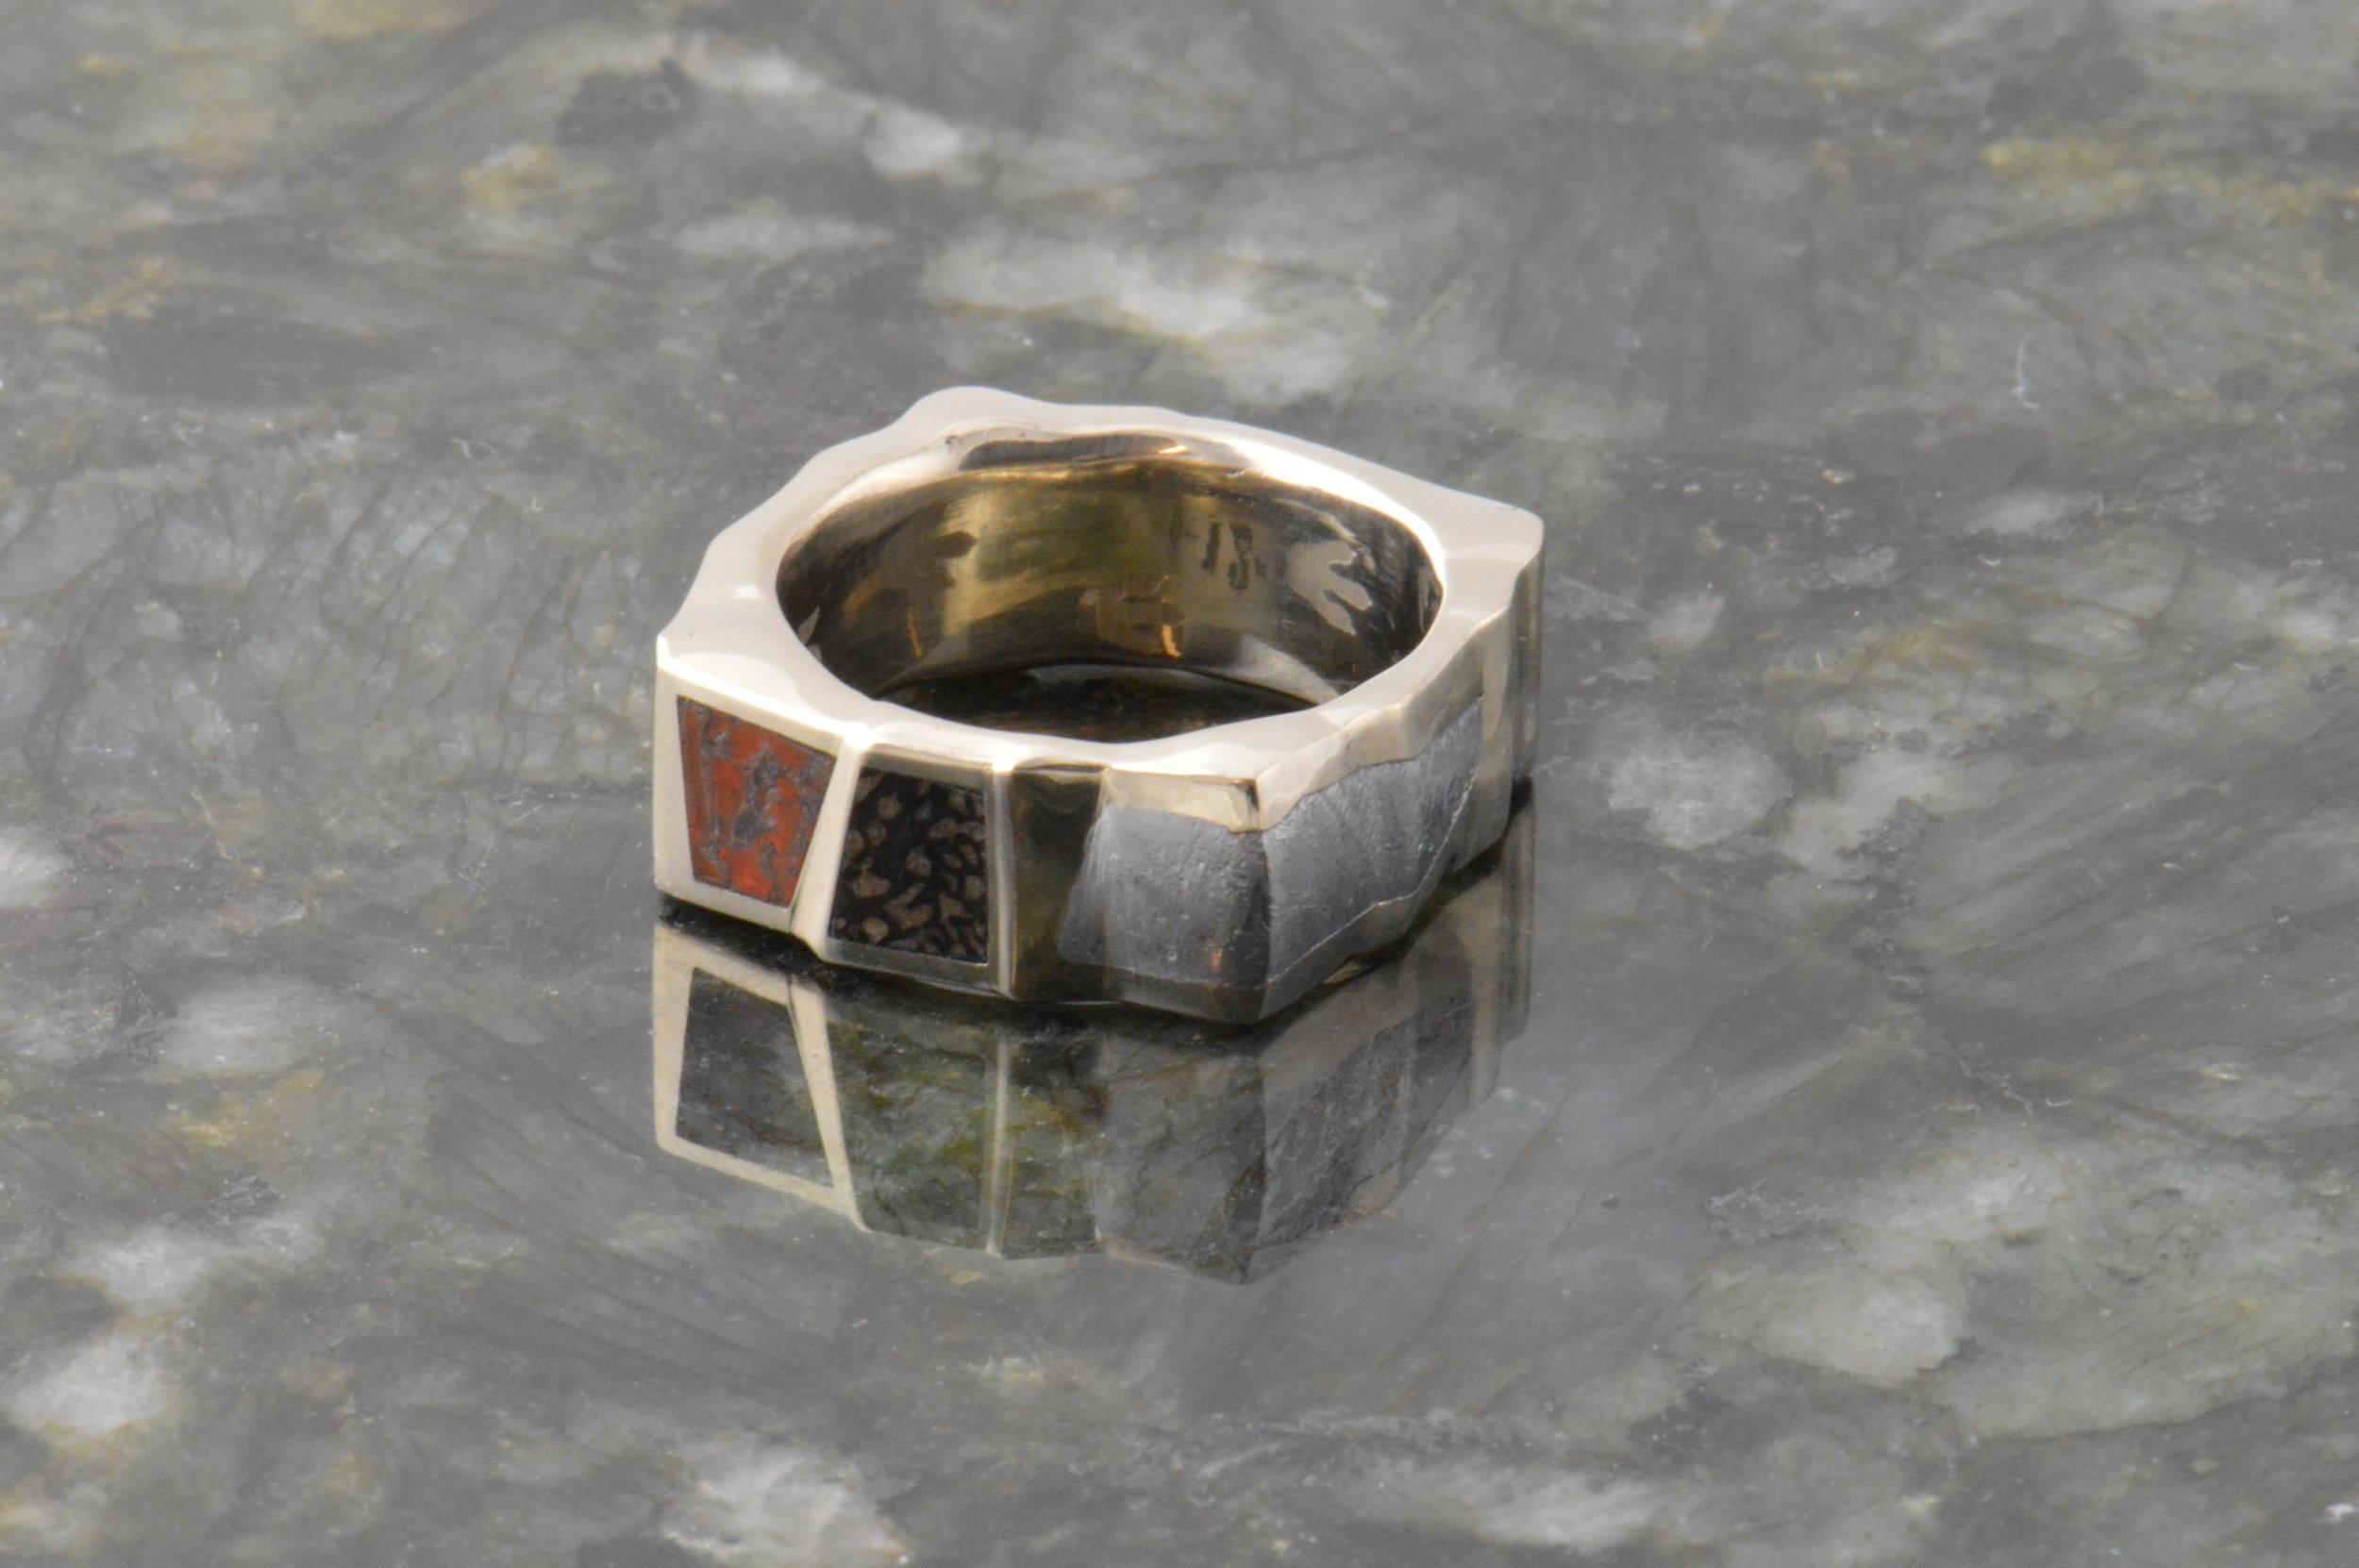 darvier-trex-meteorite-dinosaur-bone-faceted-square-wedding-band.JPG